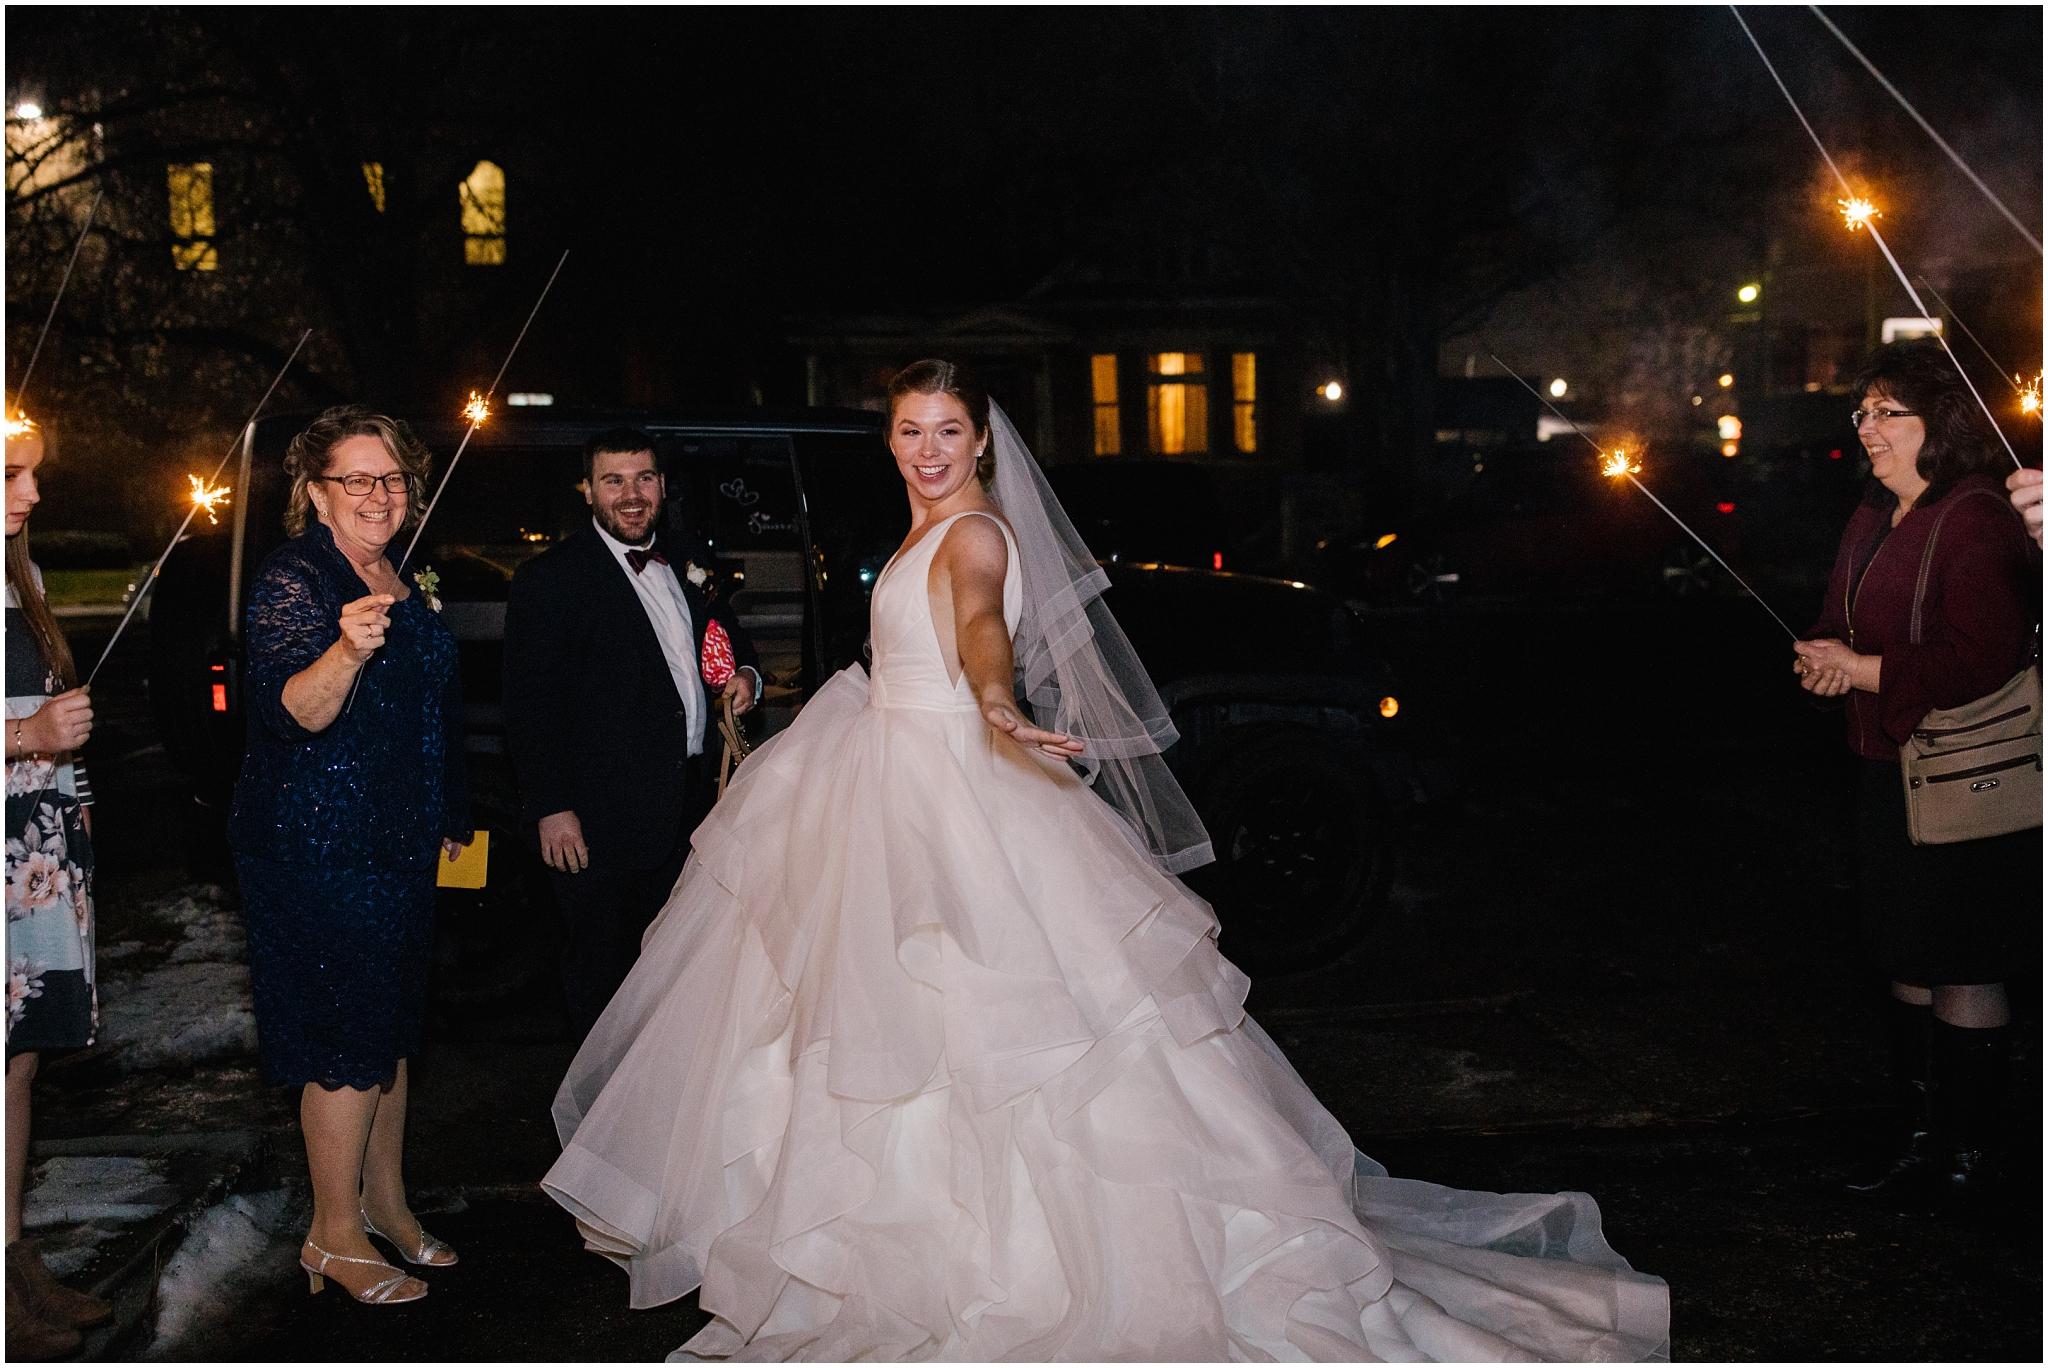 CN-Wedding-516_Lizzie-B-Imagery-Utah-Wedding-Photographer-Blessed-Sacrament-Catholic-Church-Sandy-Utah-The-Blended-Table-Salt-Lake-City.jpg